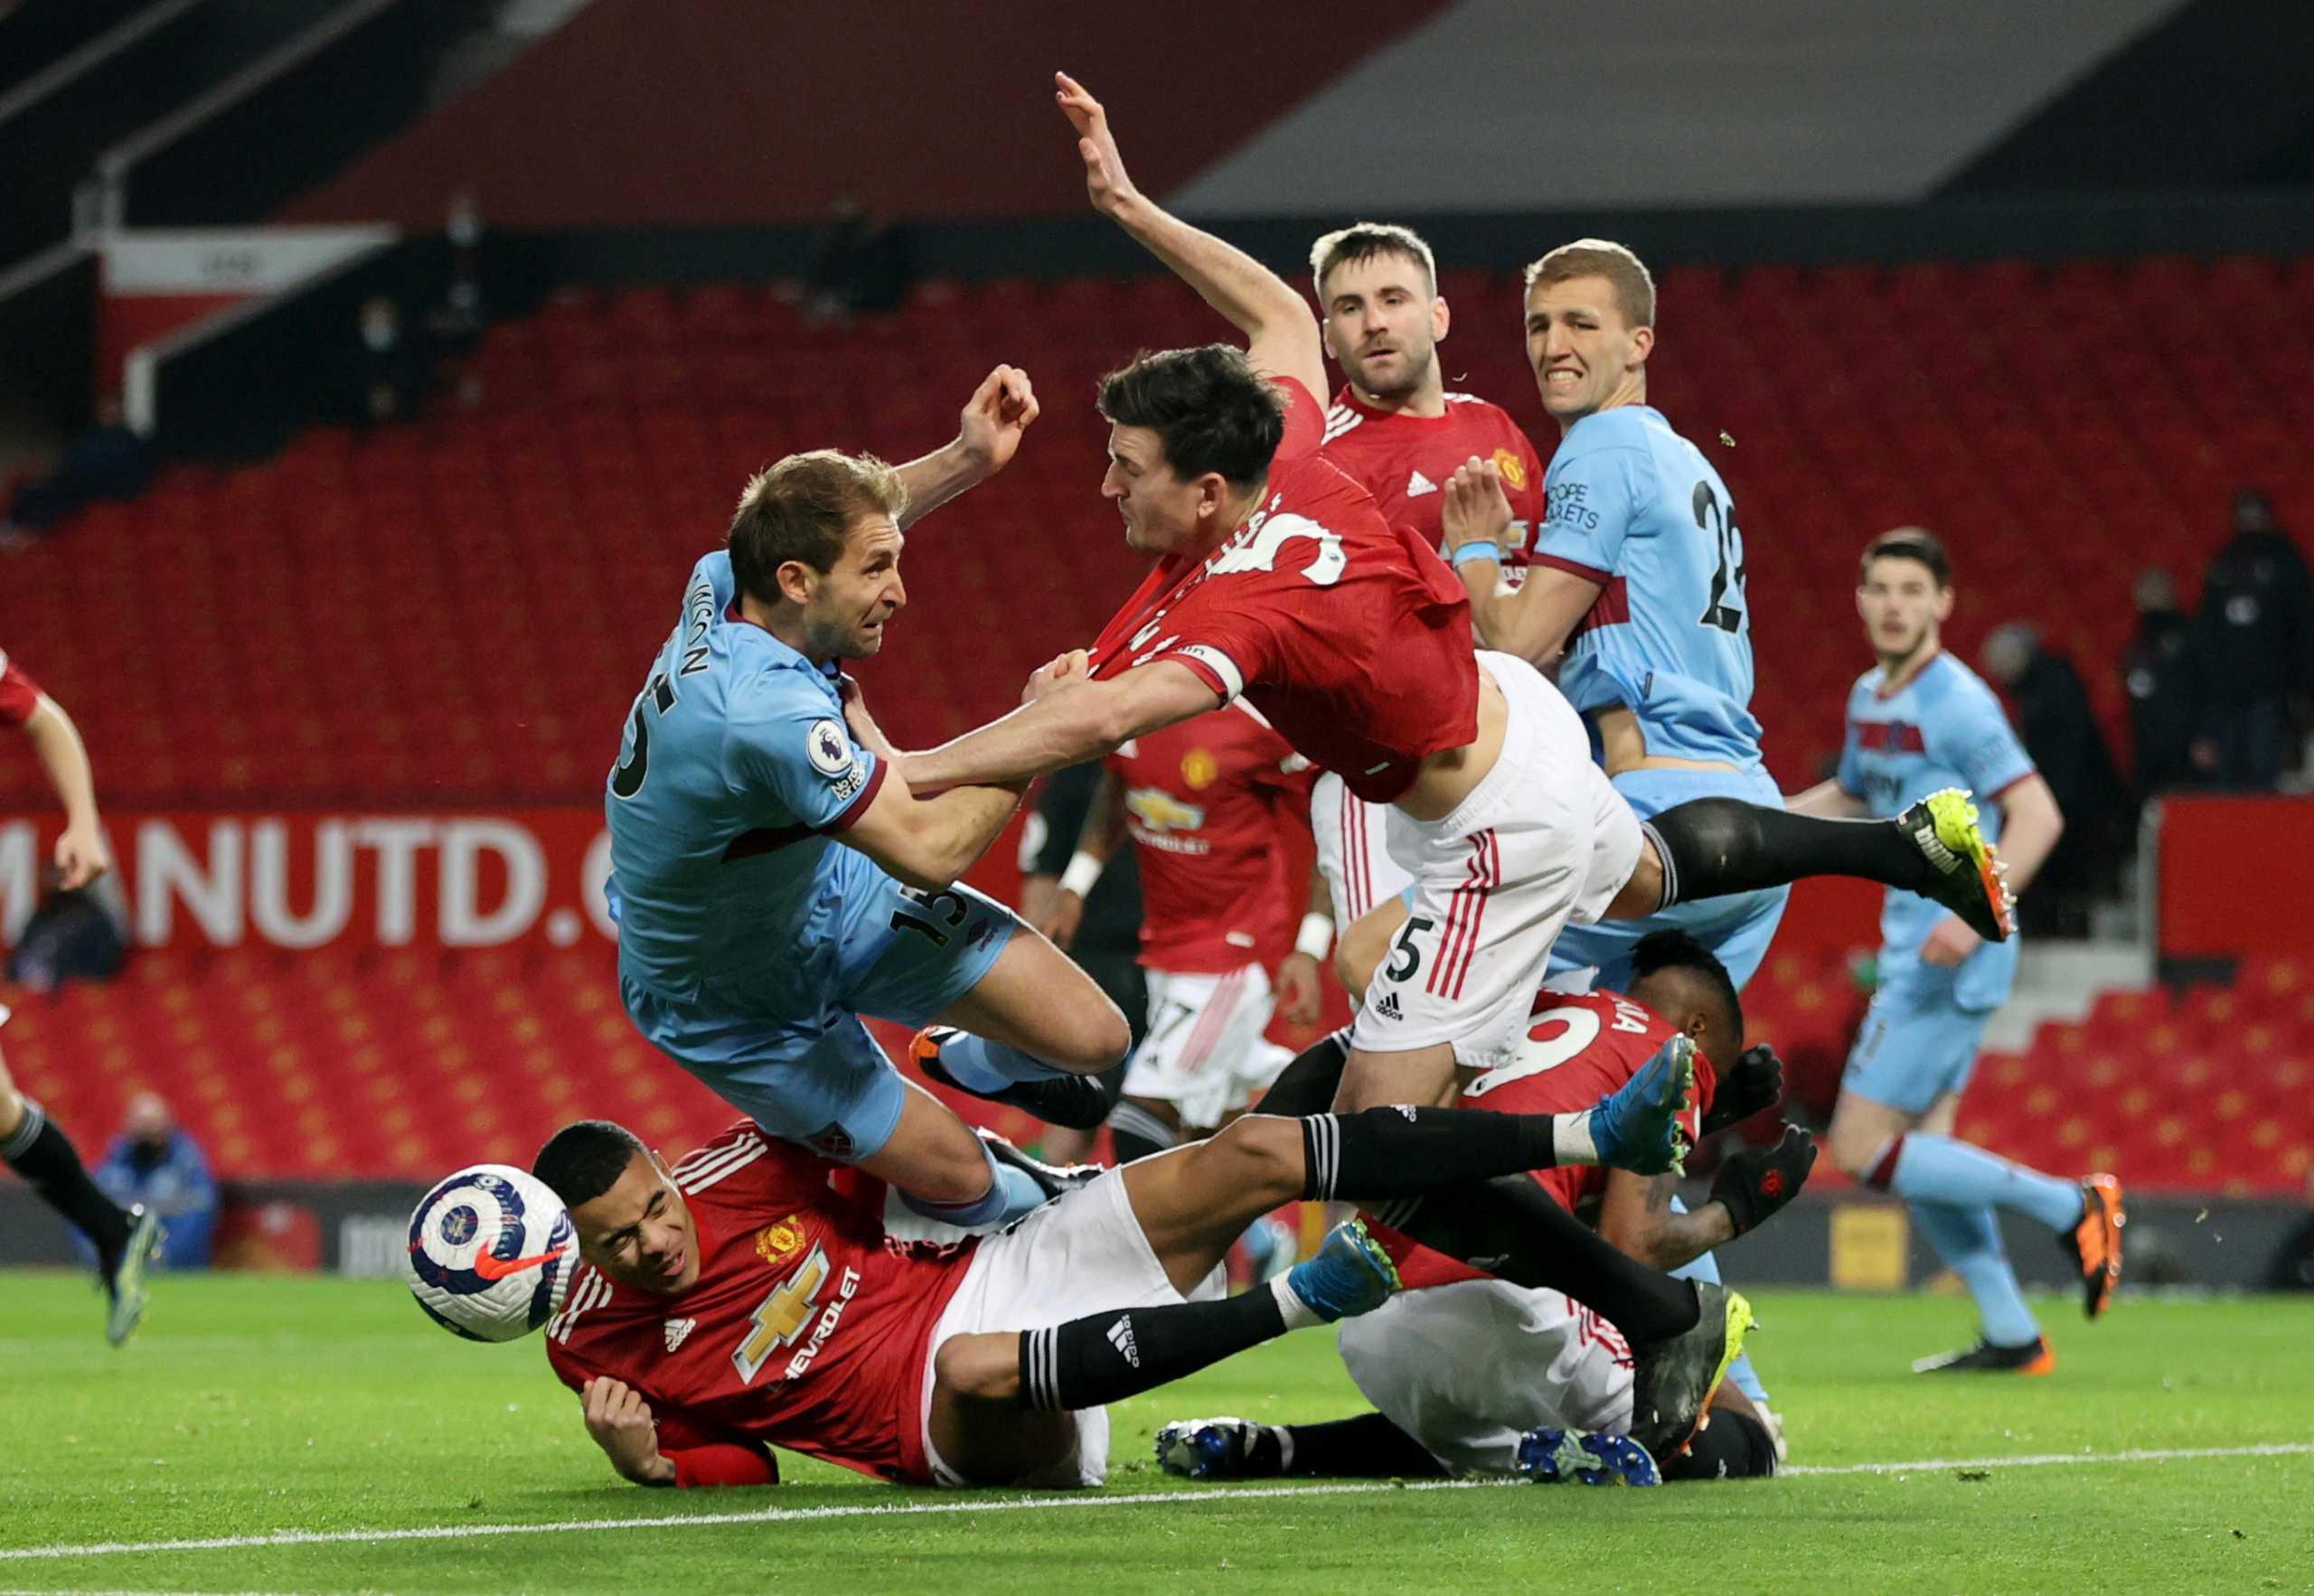 Premier League: Δεύτερη η Γιουνάιτεντ με αυτογκόλ (video)